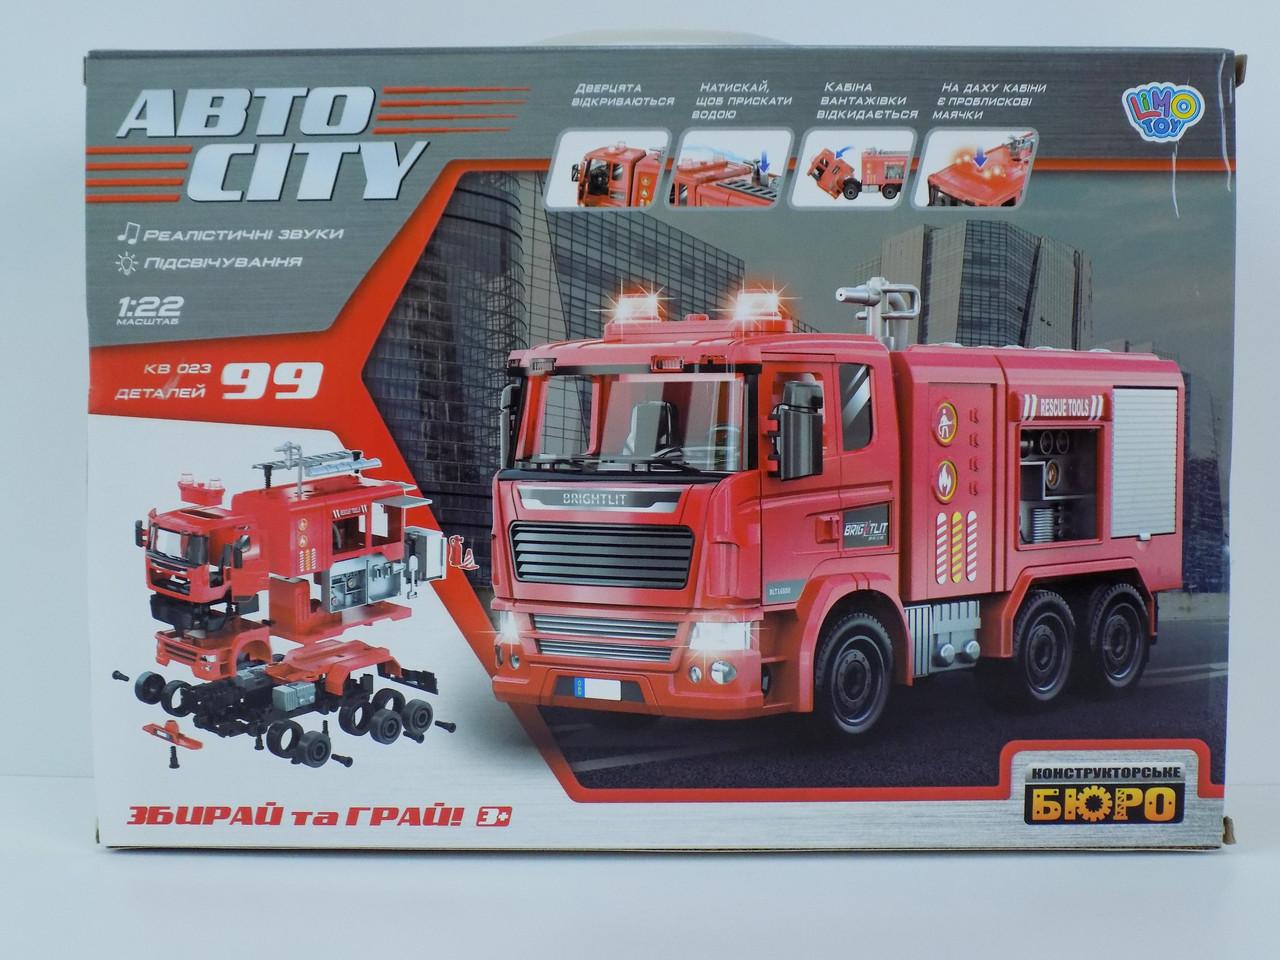 Конструктор на шурупах пожежна машина Auto city